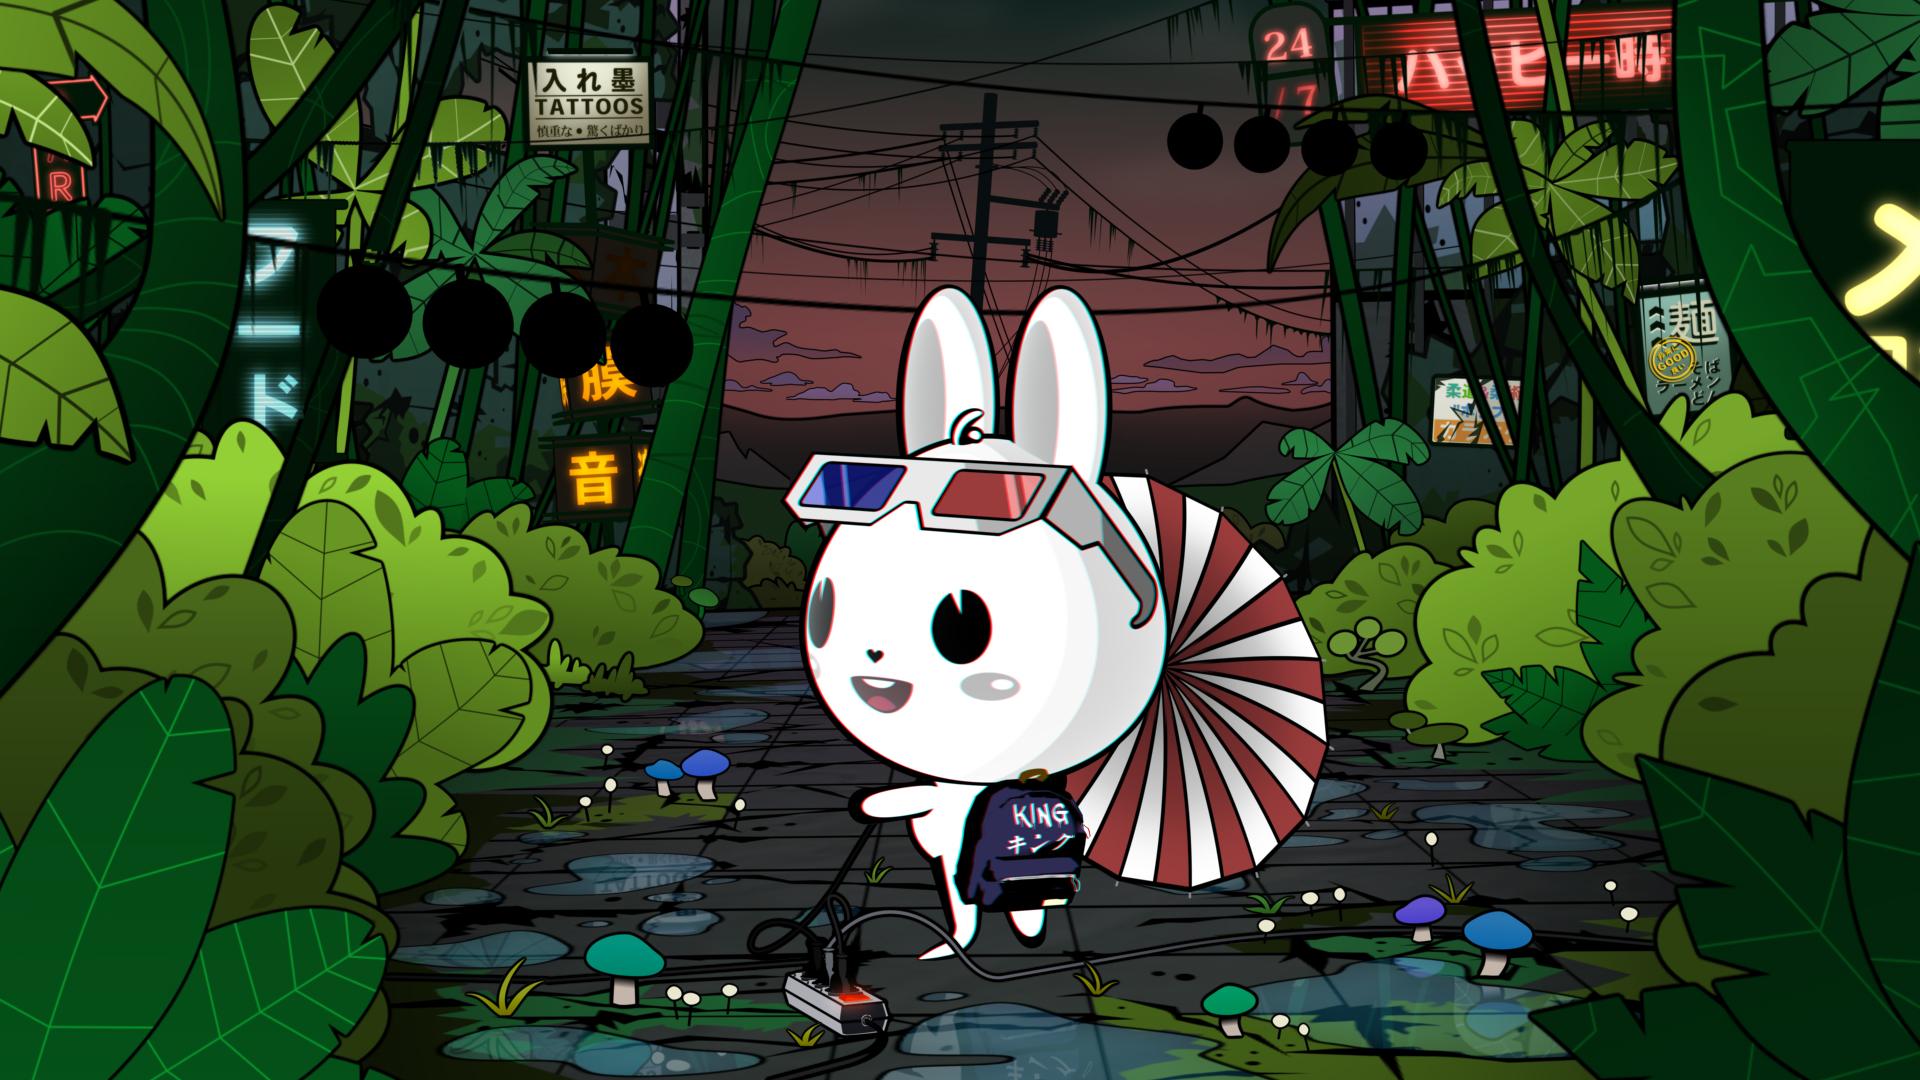 BunnyKing_08.jpg